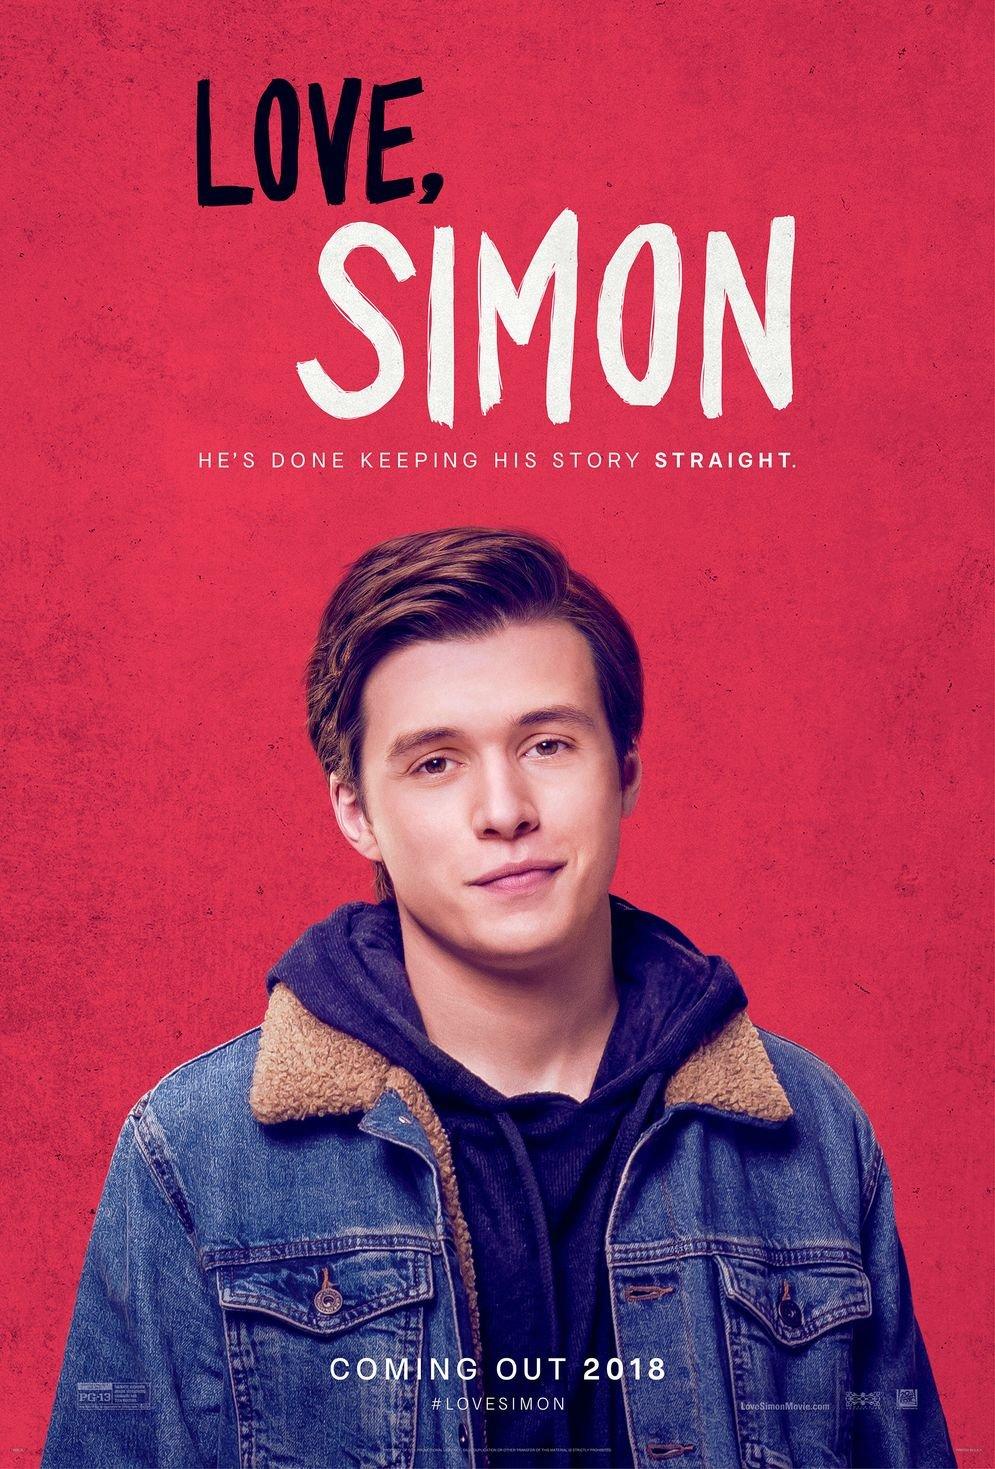 Kirbis Love Simon Movie Poster 18 x 28 Inches